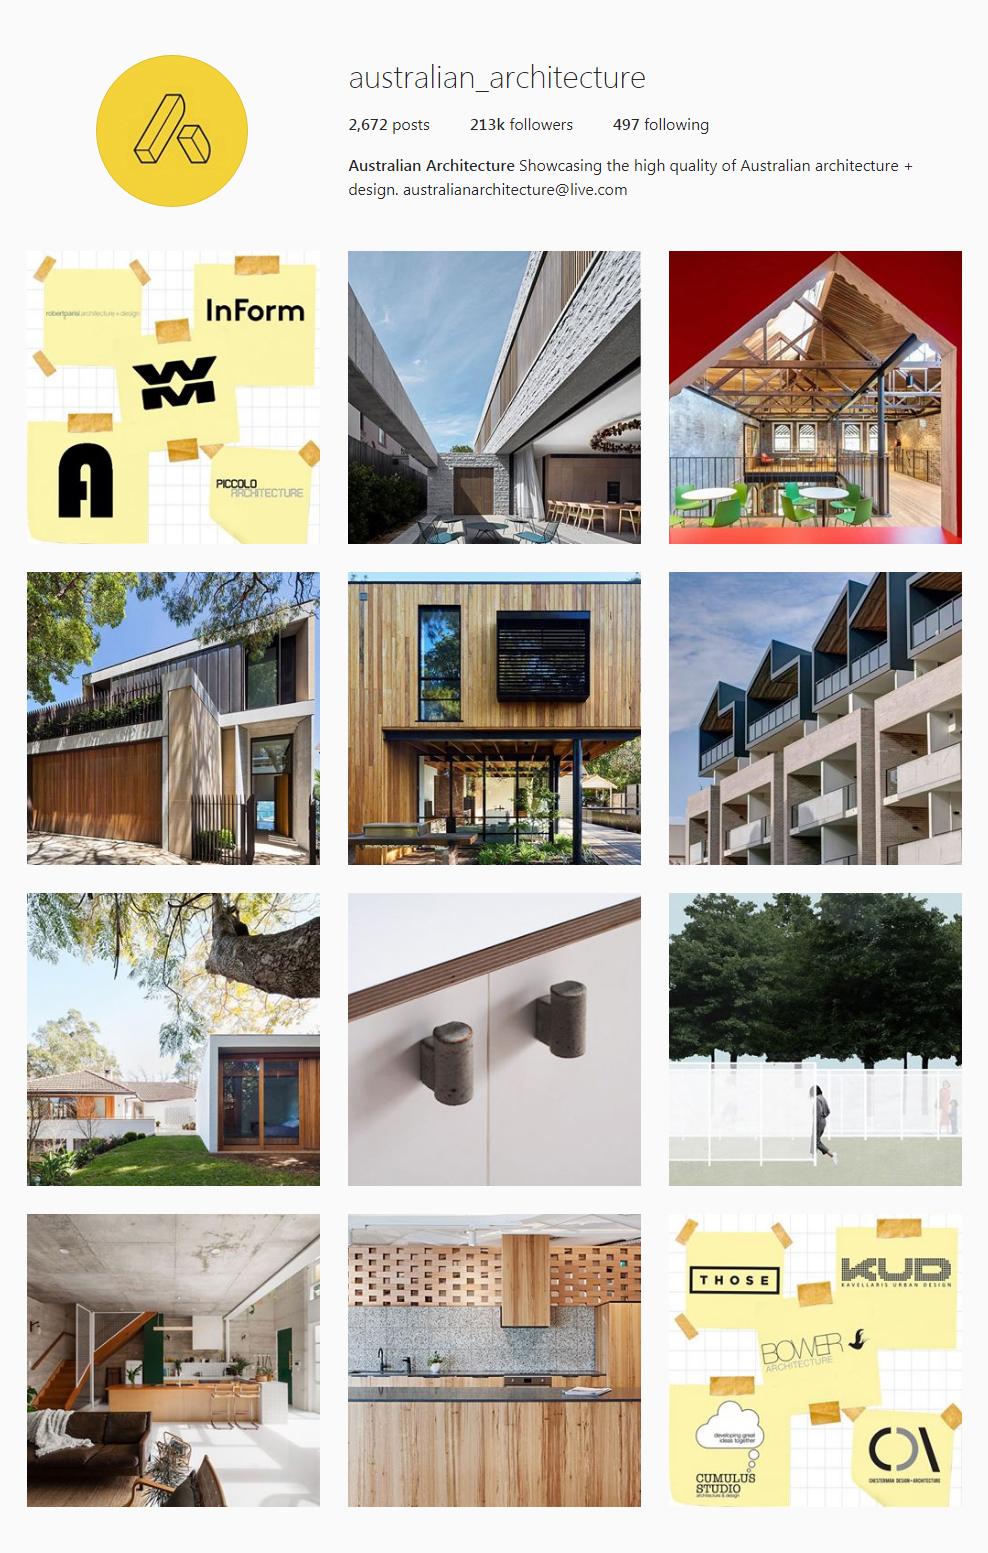 Best Architectural Instagram Feeds of 2017 - australian_architecture